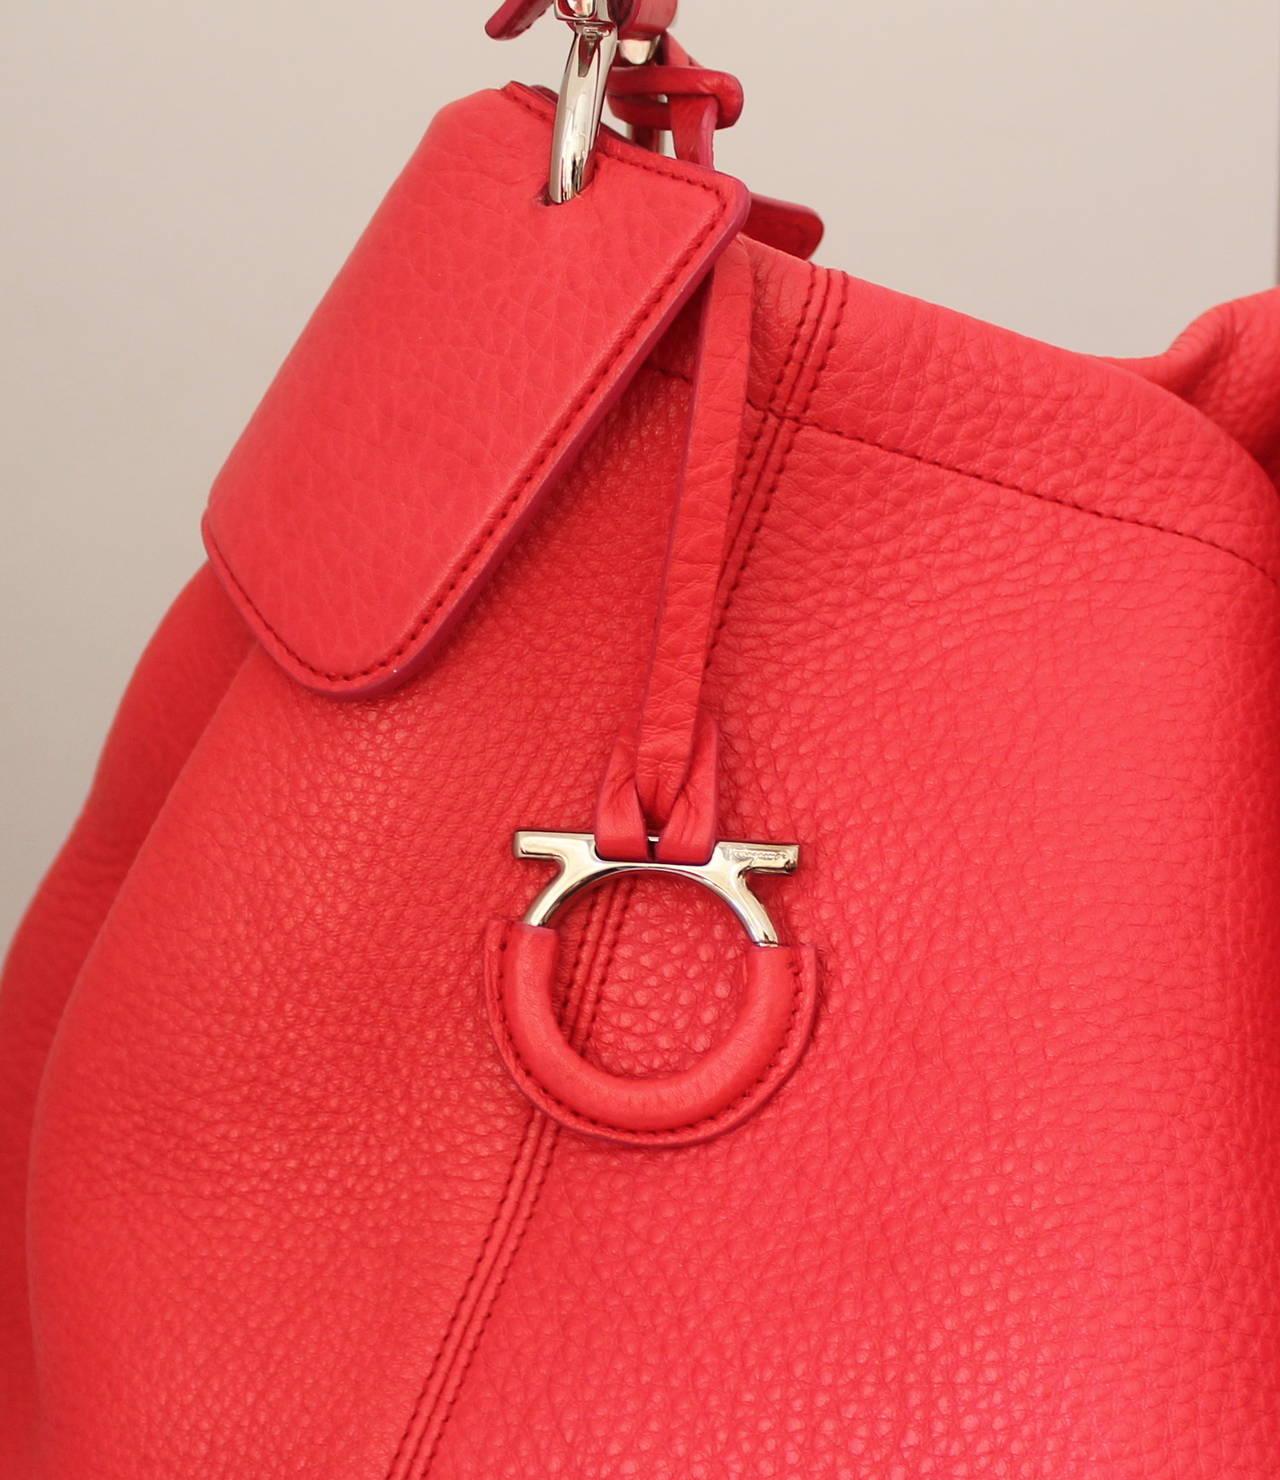 Salvatore Ferragamo Watermelon Pebbled Leather Shoulder Bag 3